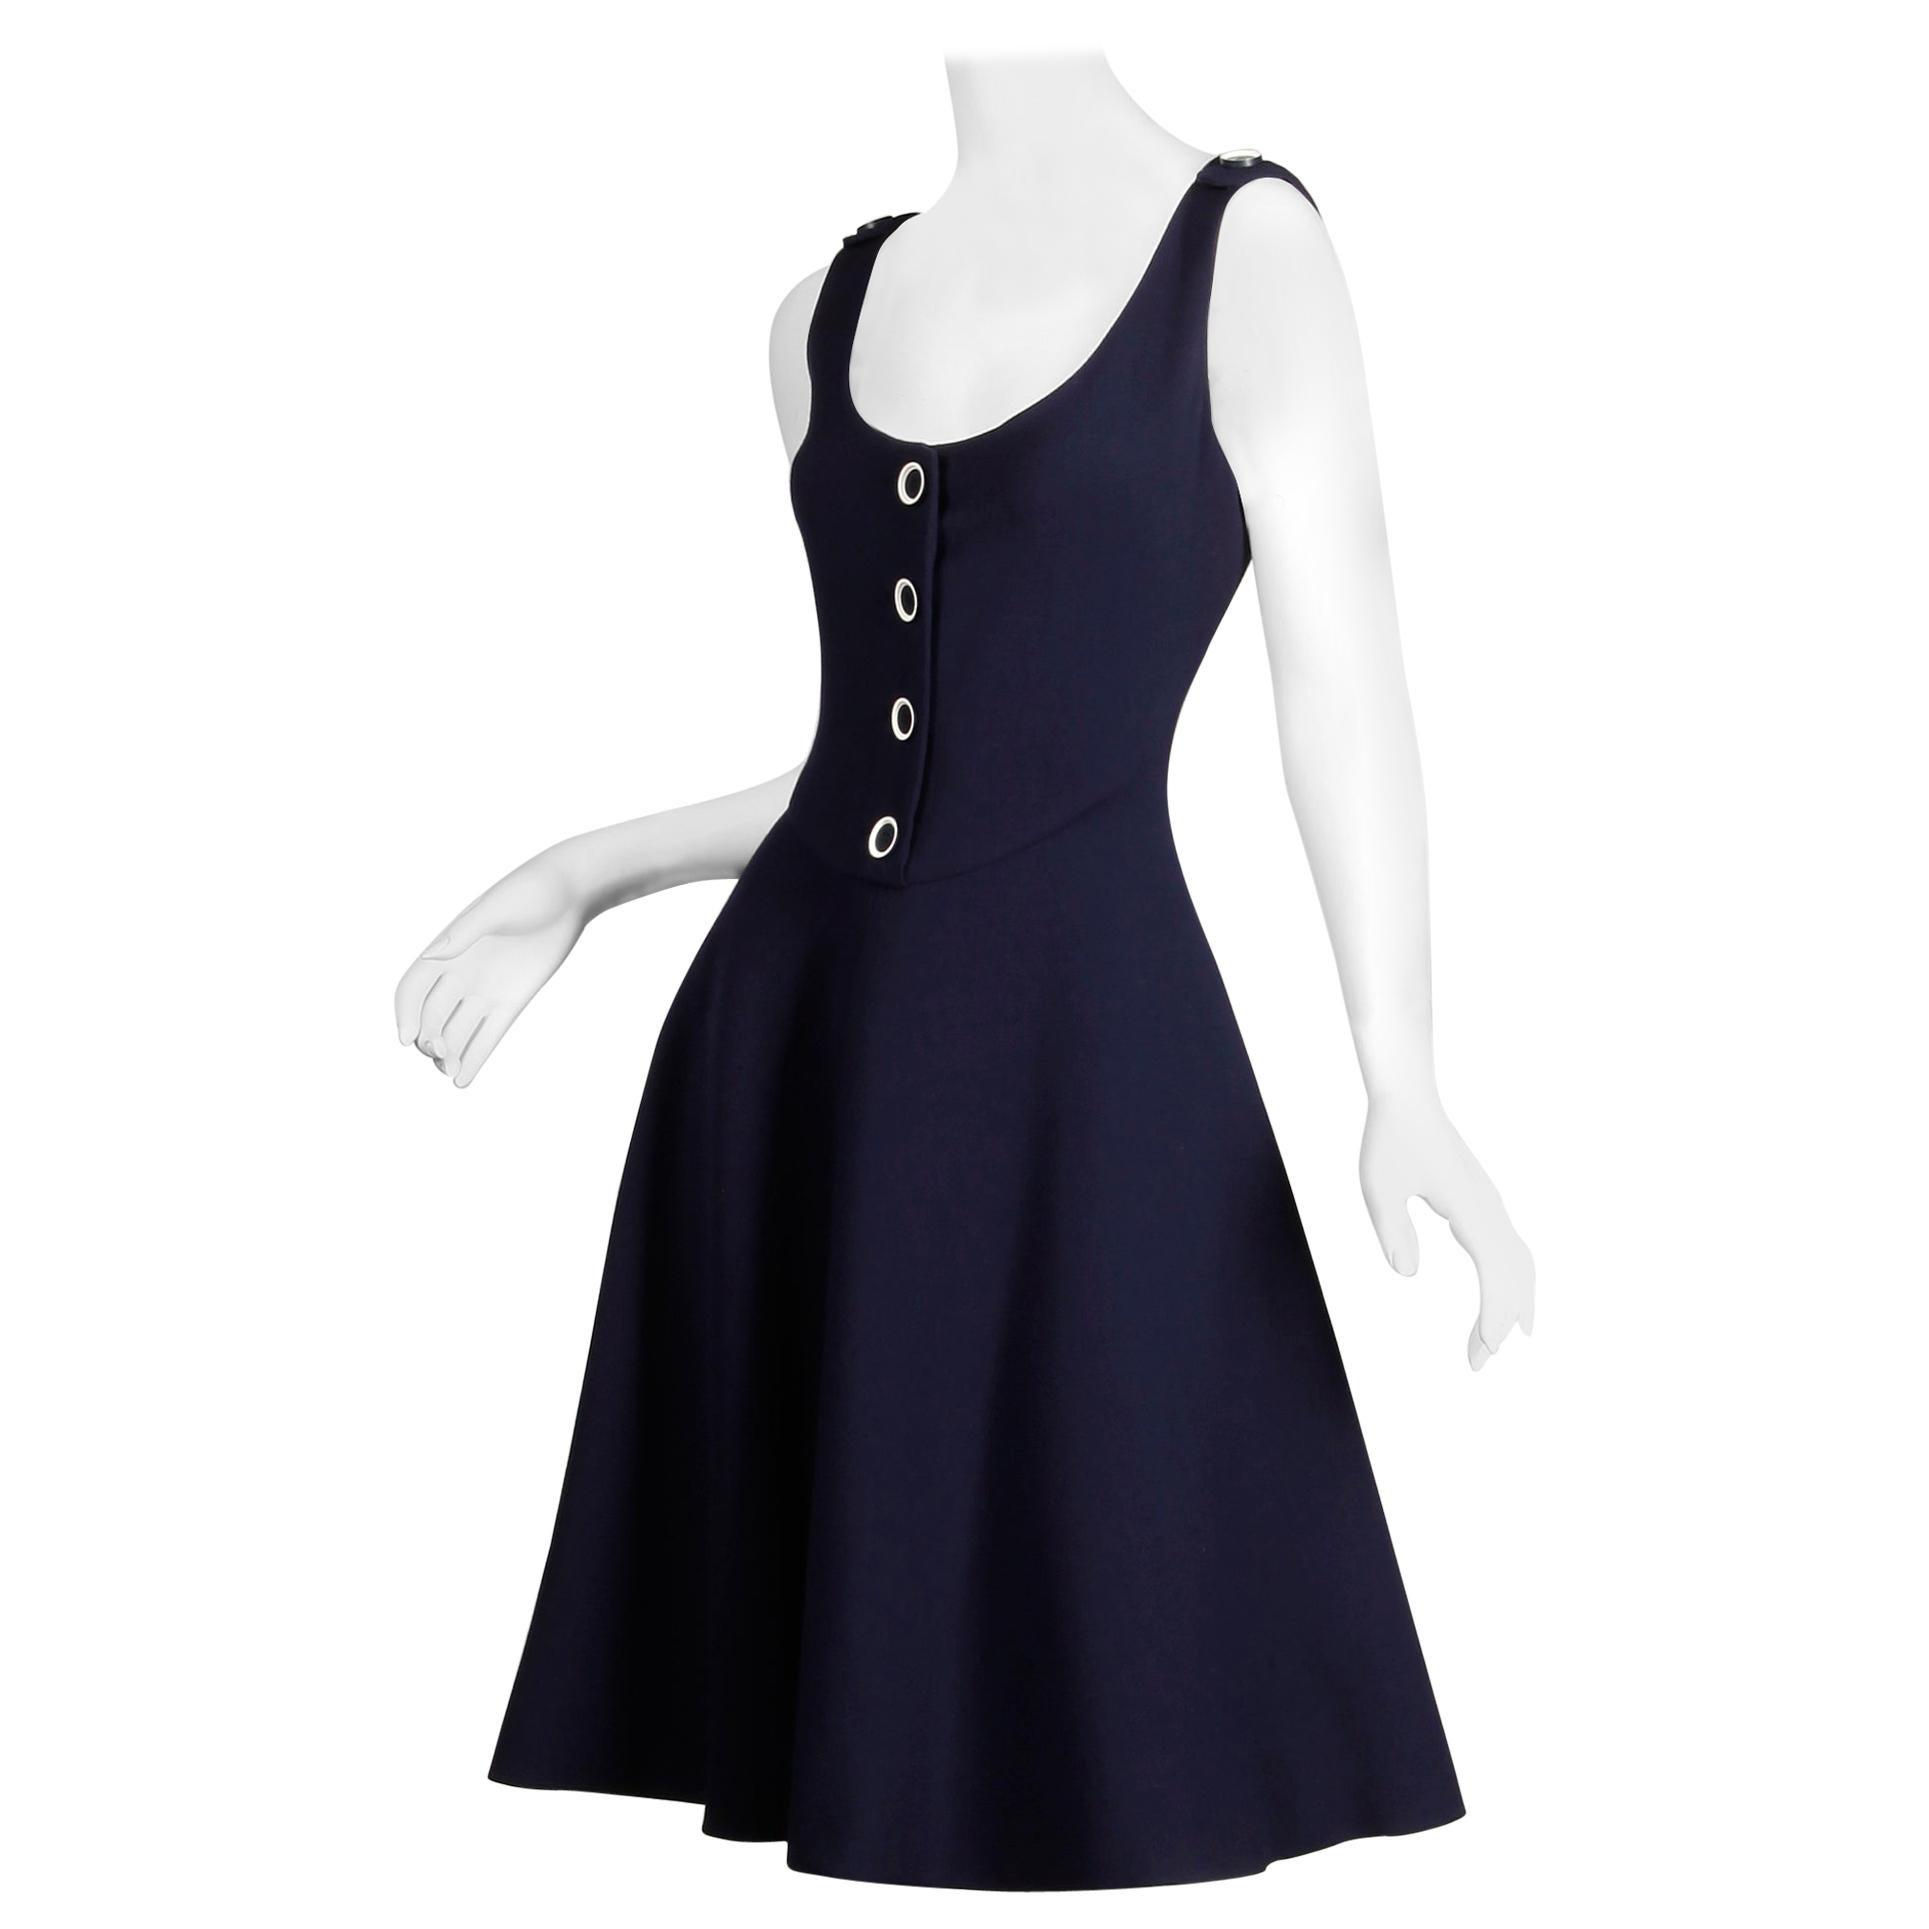 Geoffrey Beene Dress; Vintage 1960s-1970s